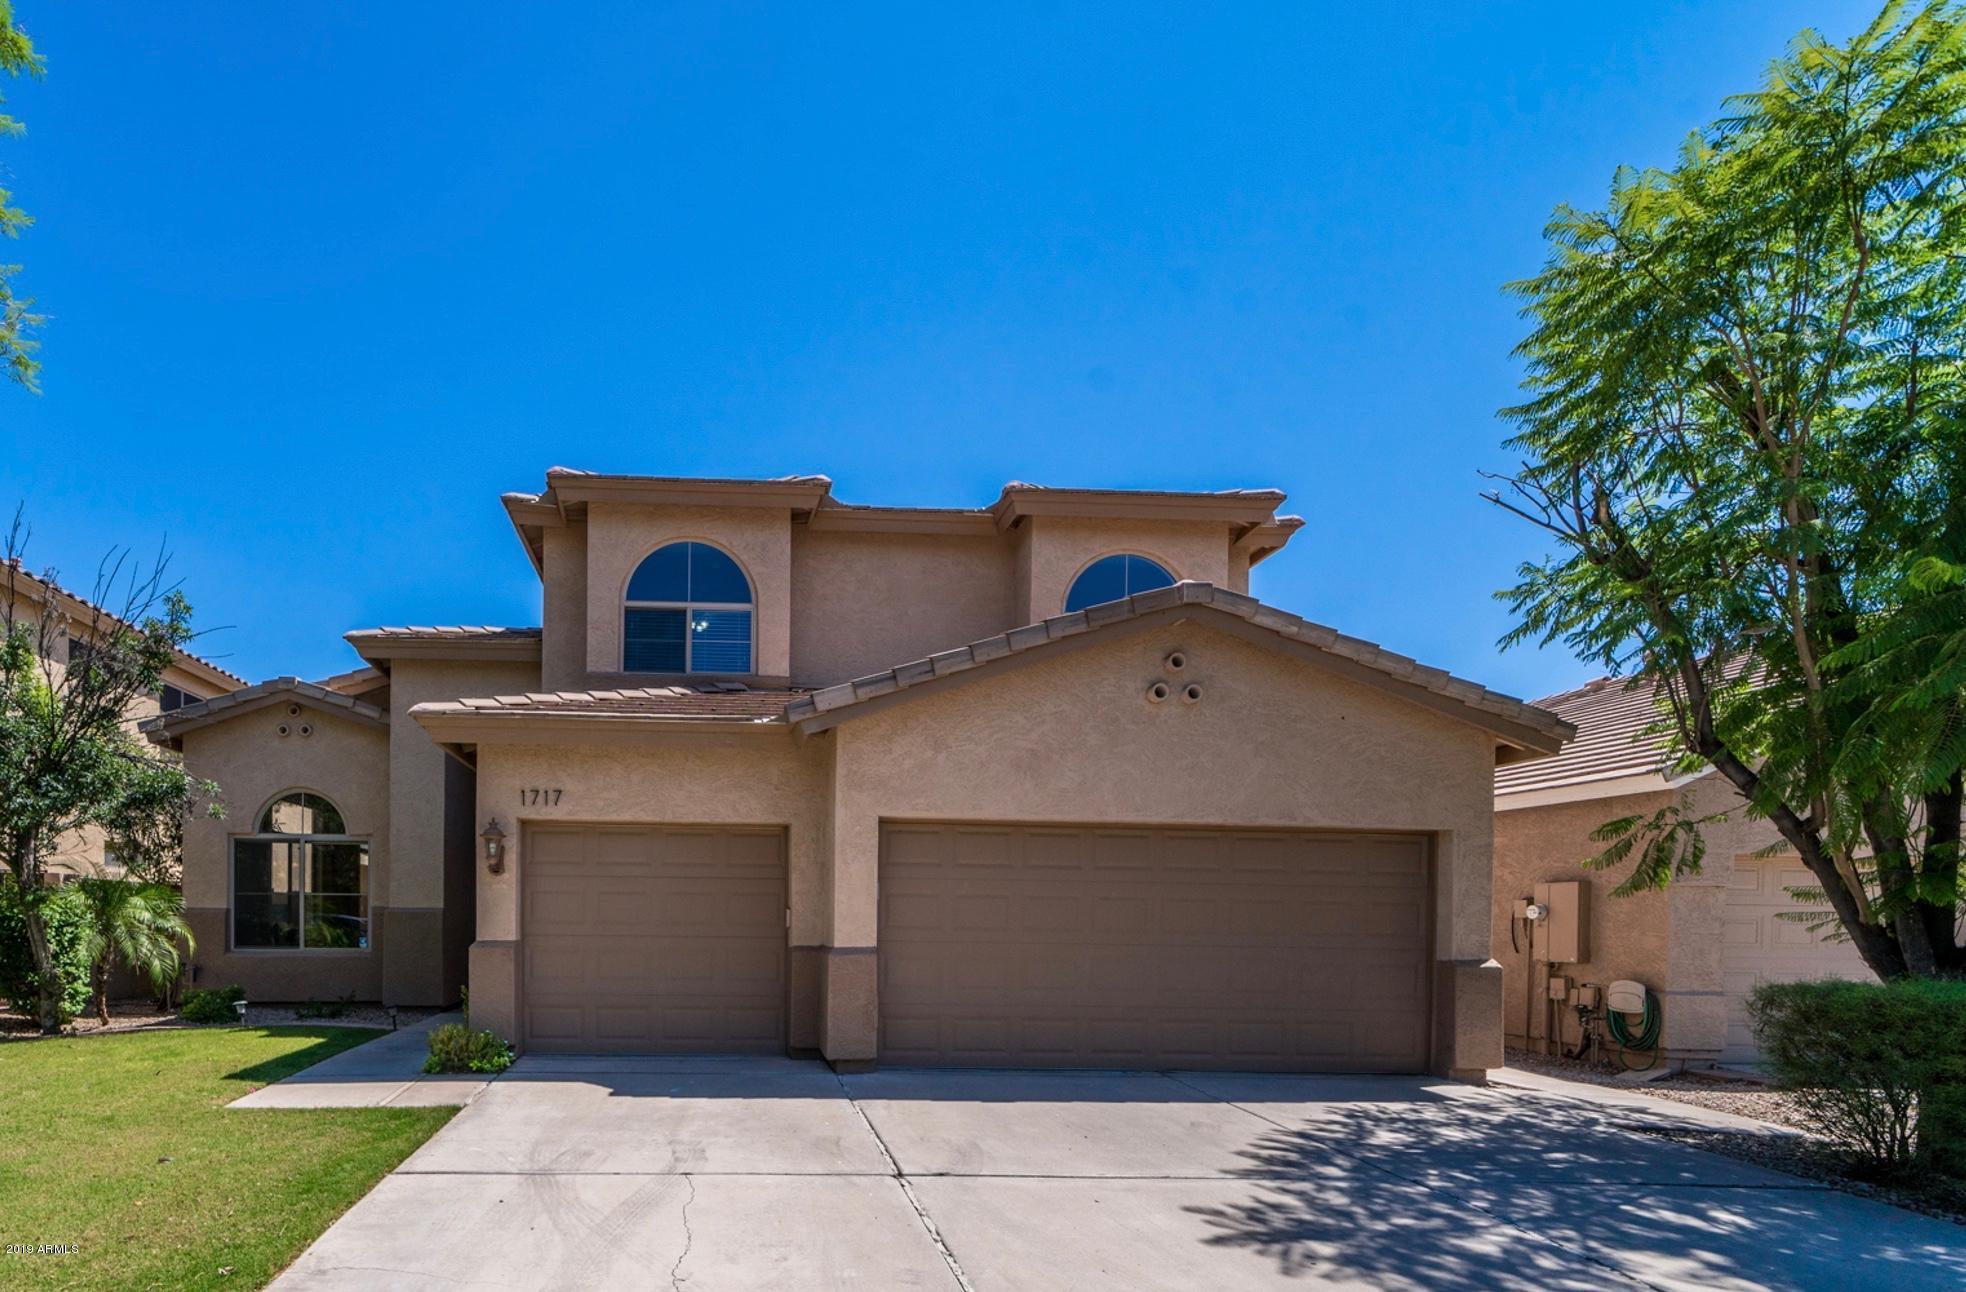 MLS 5951053 1717 E CORTEZ Drive, Gilbert, AZ 85234 Gilbert AZ Val Vista Lakes